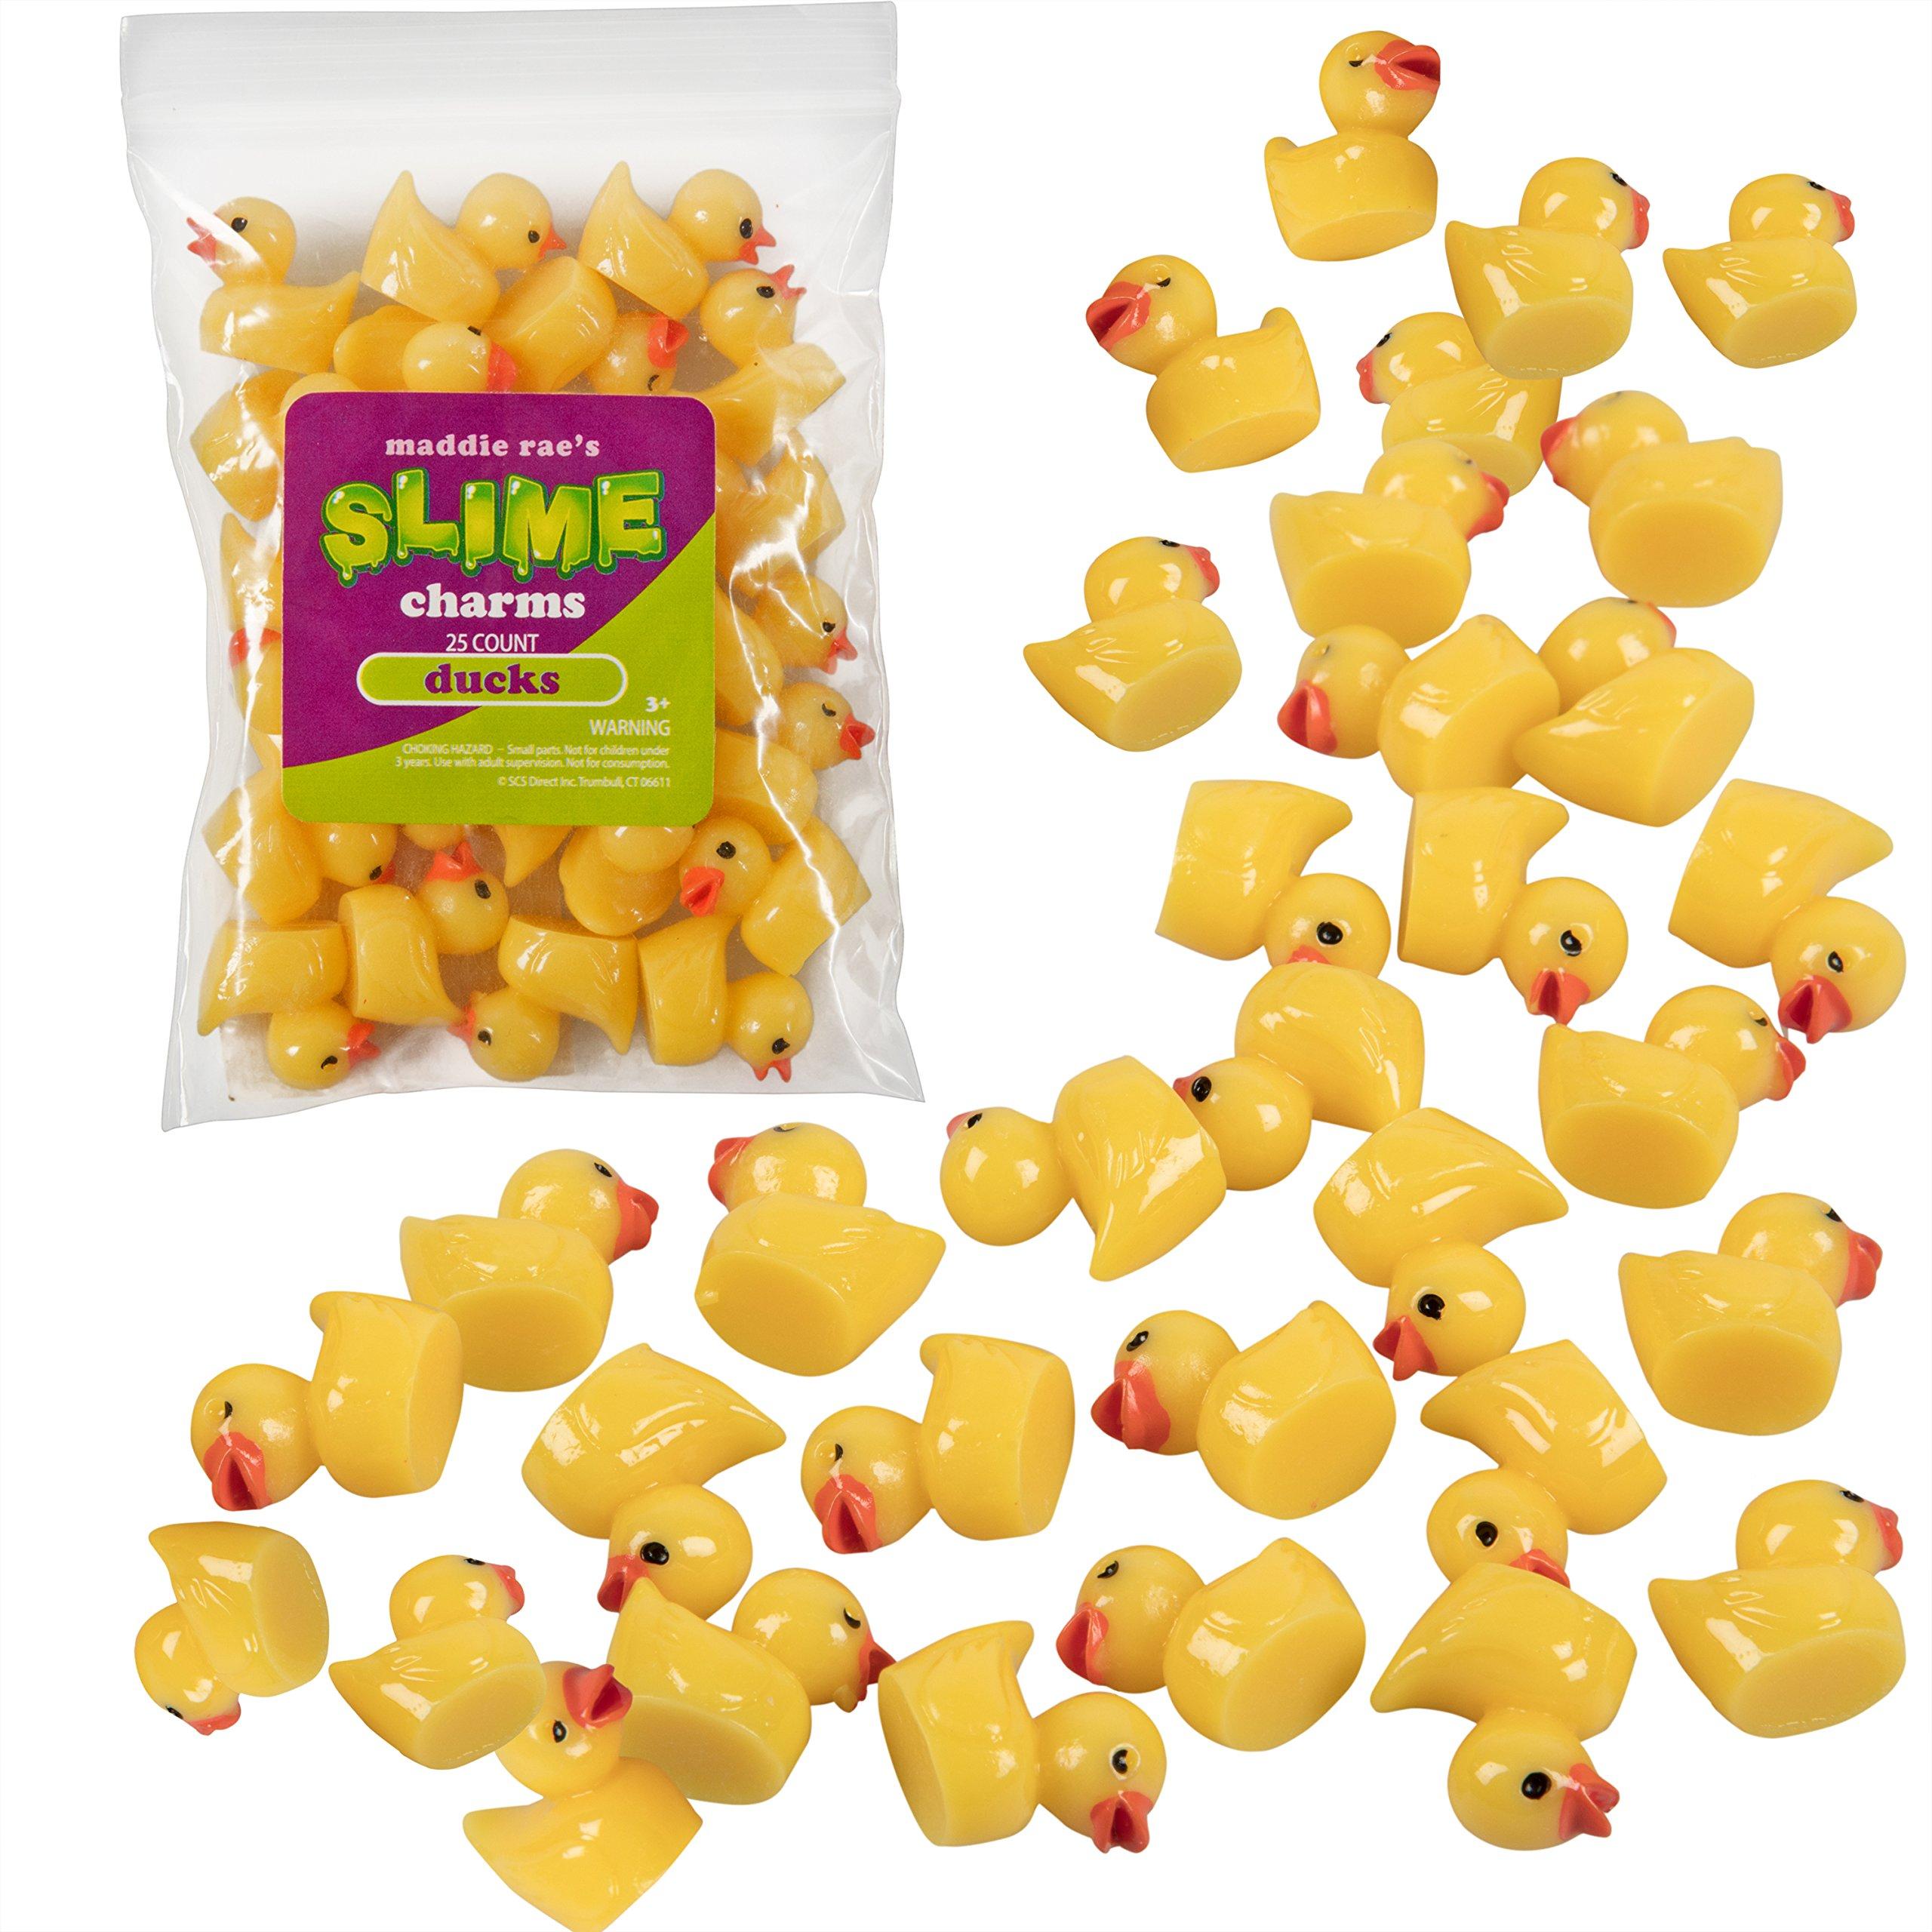 Maddie Rae's Slime Charms, Ducks 25 pcs of Slime Beads